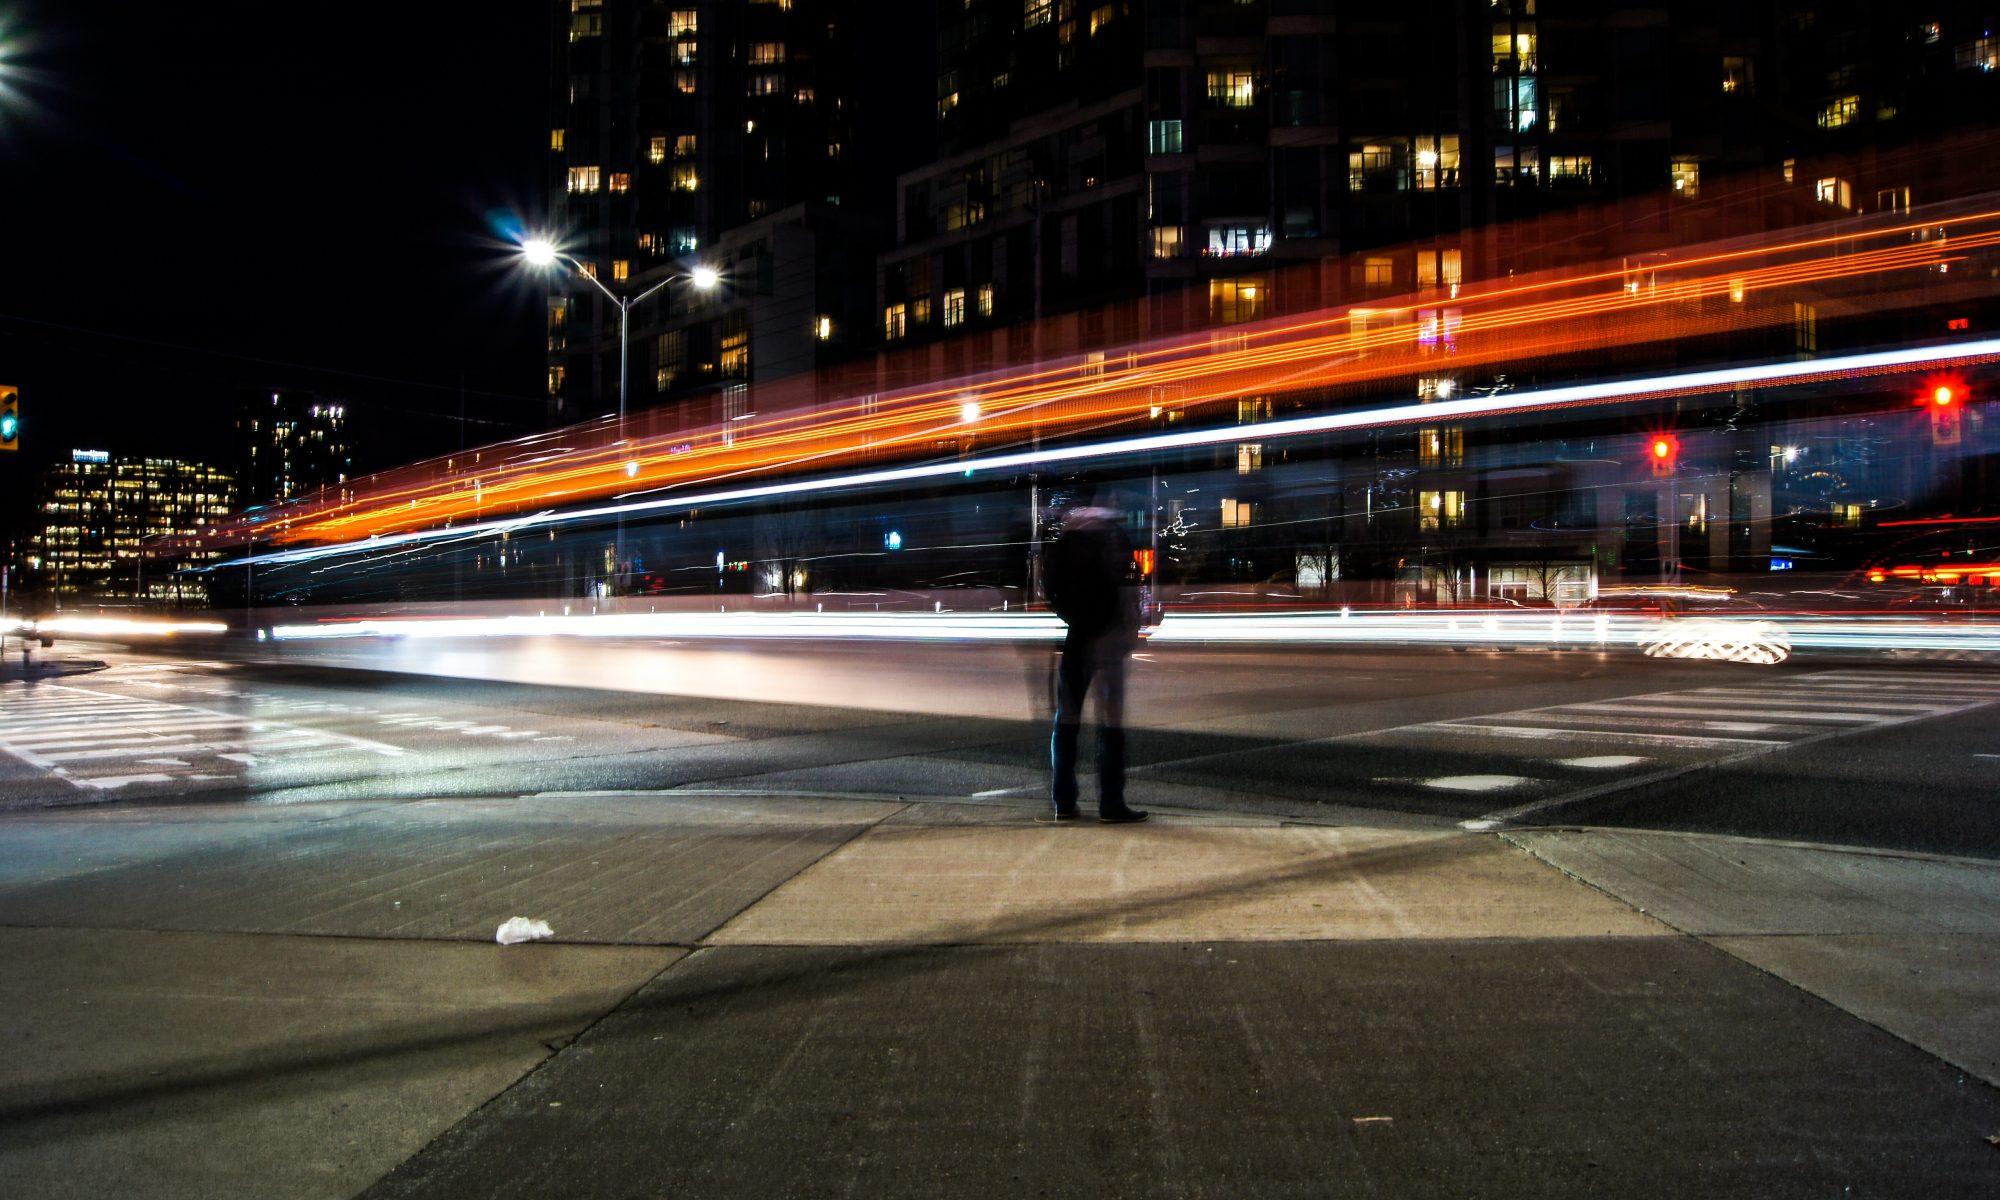 Public transit agencies need faster transit